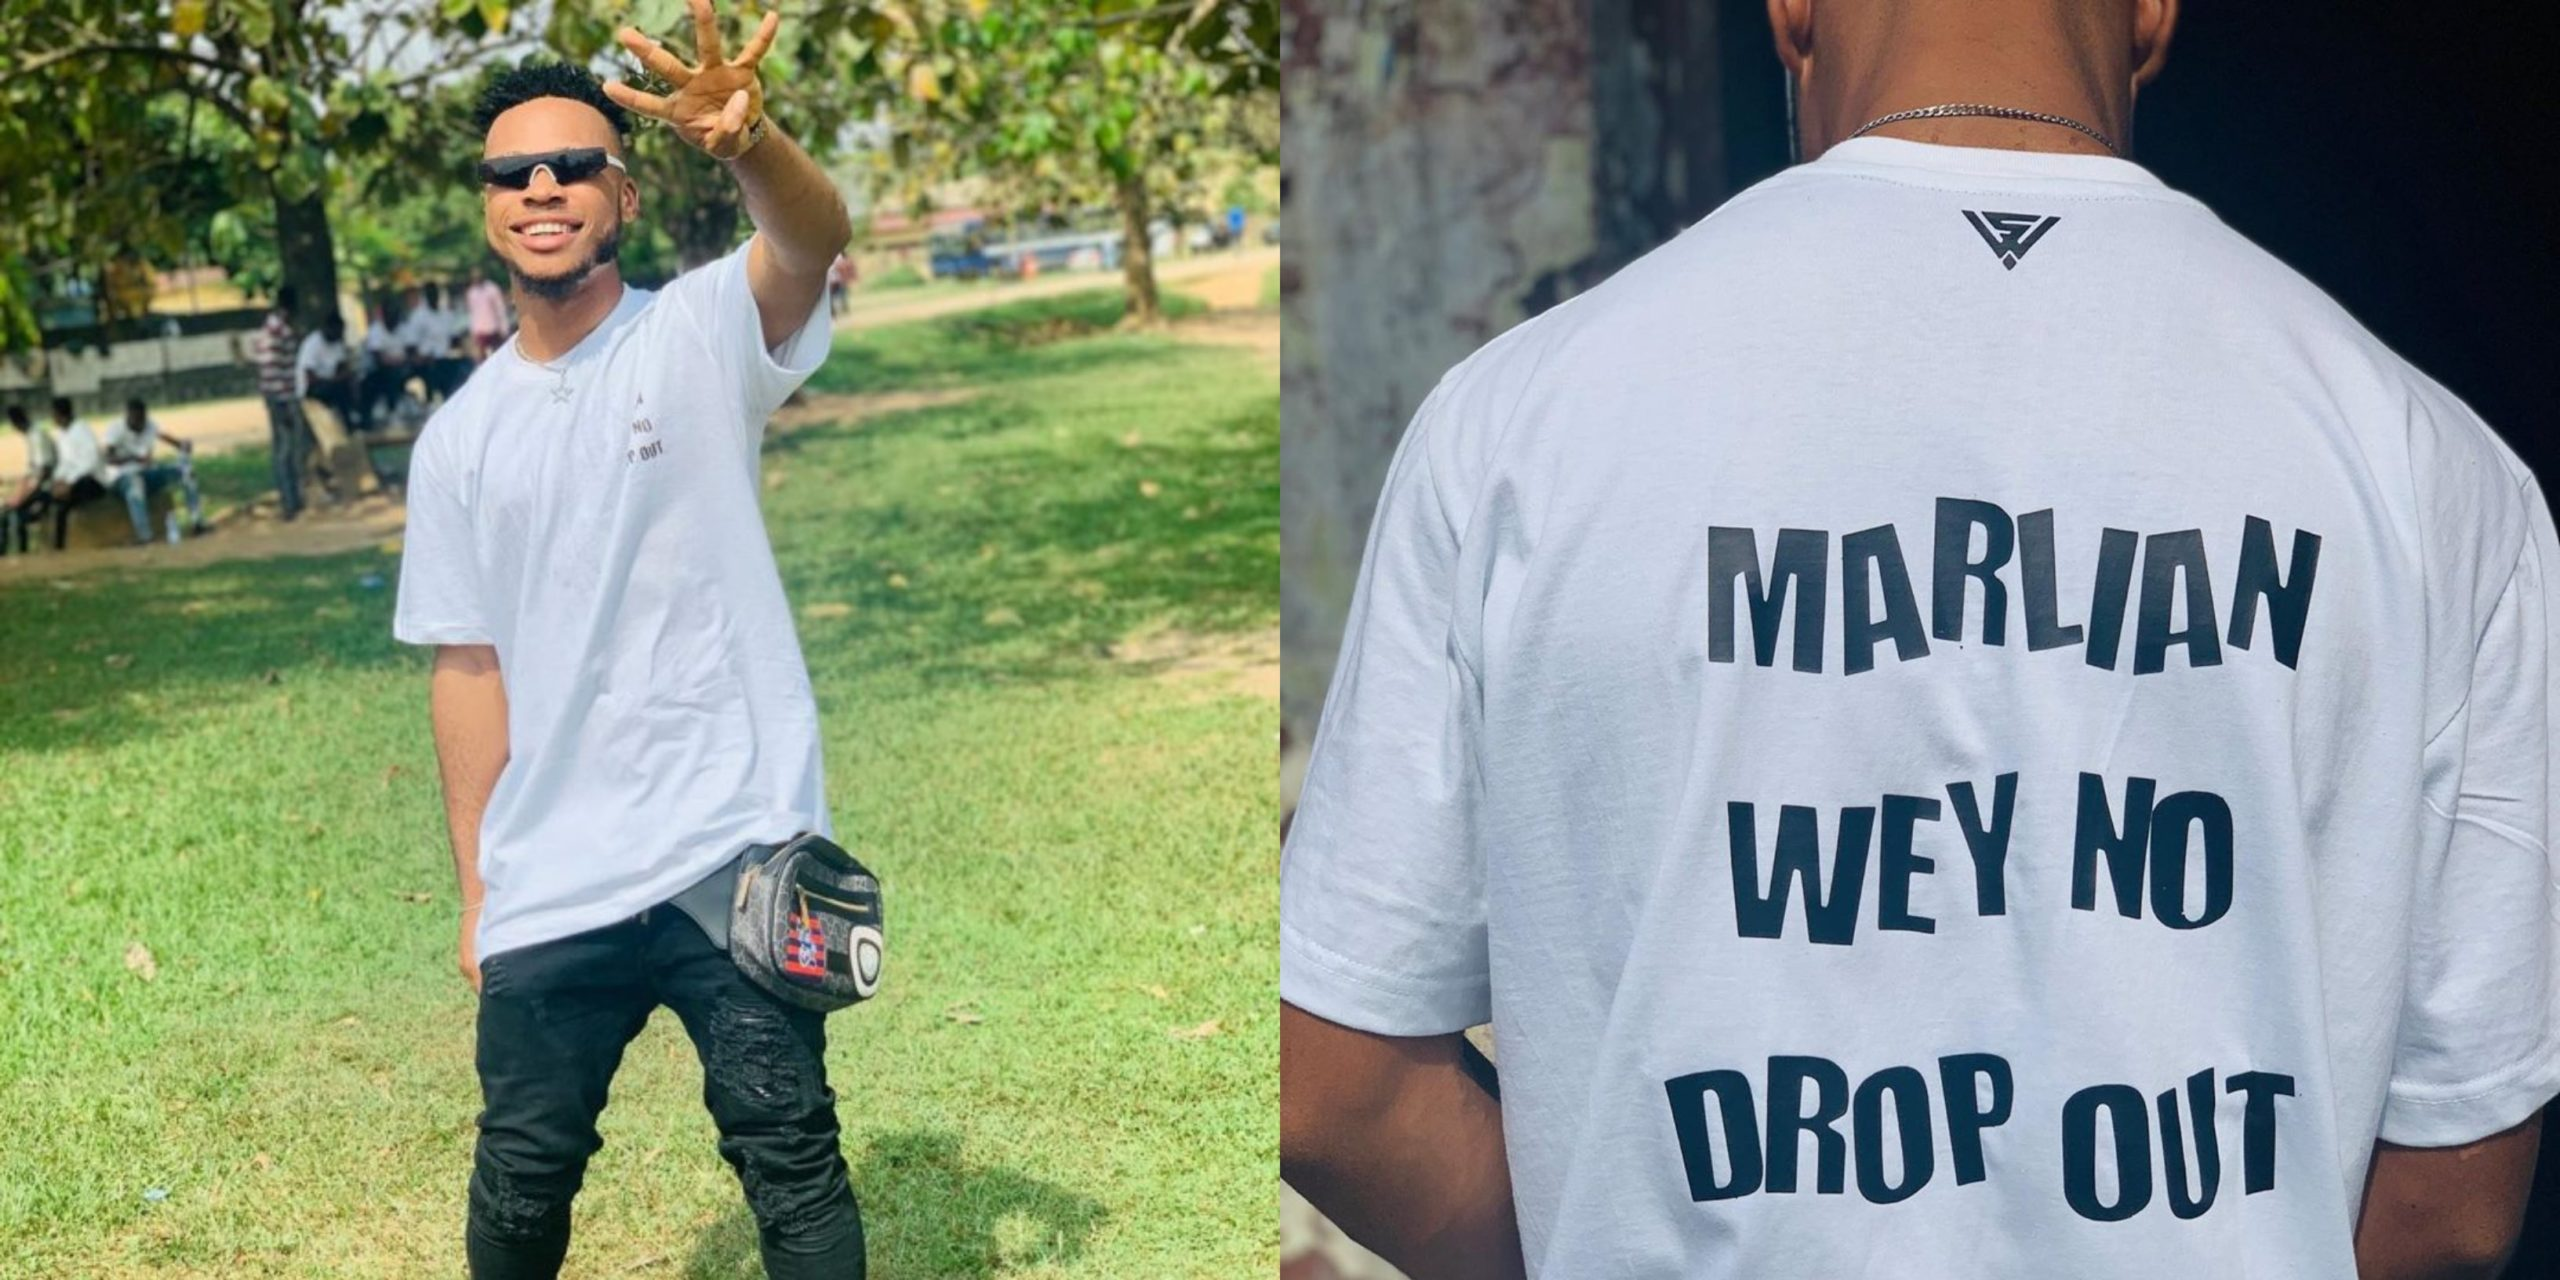 Marlian wey no dropout - Popular dancer, Poco Lee graduates from Lagos State University (Photos)